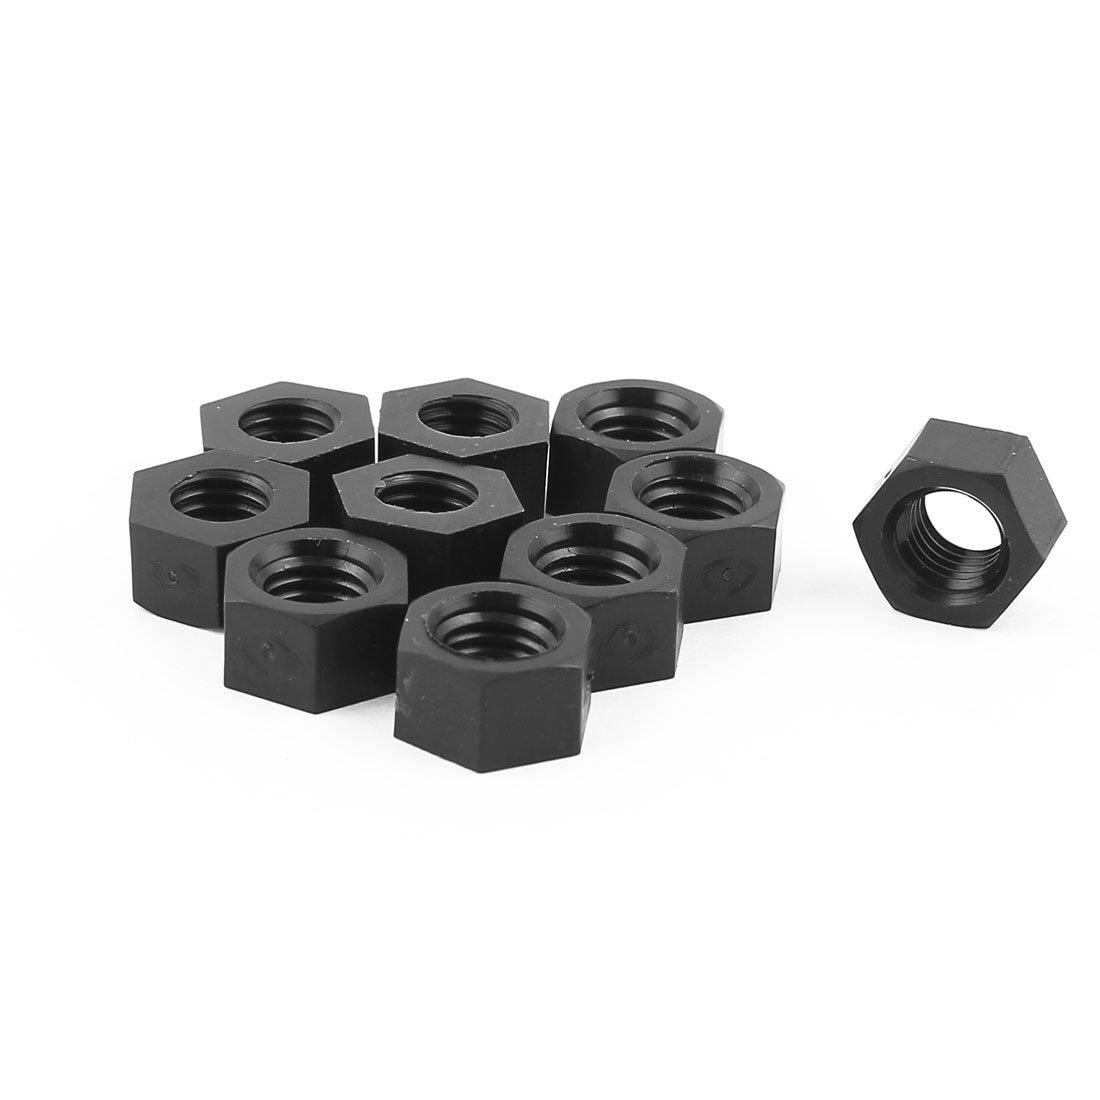 10pcs Pack Of Metric M10 Insert Lock Nylon Full Hex Nuts Plastic Black